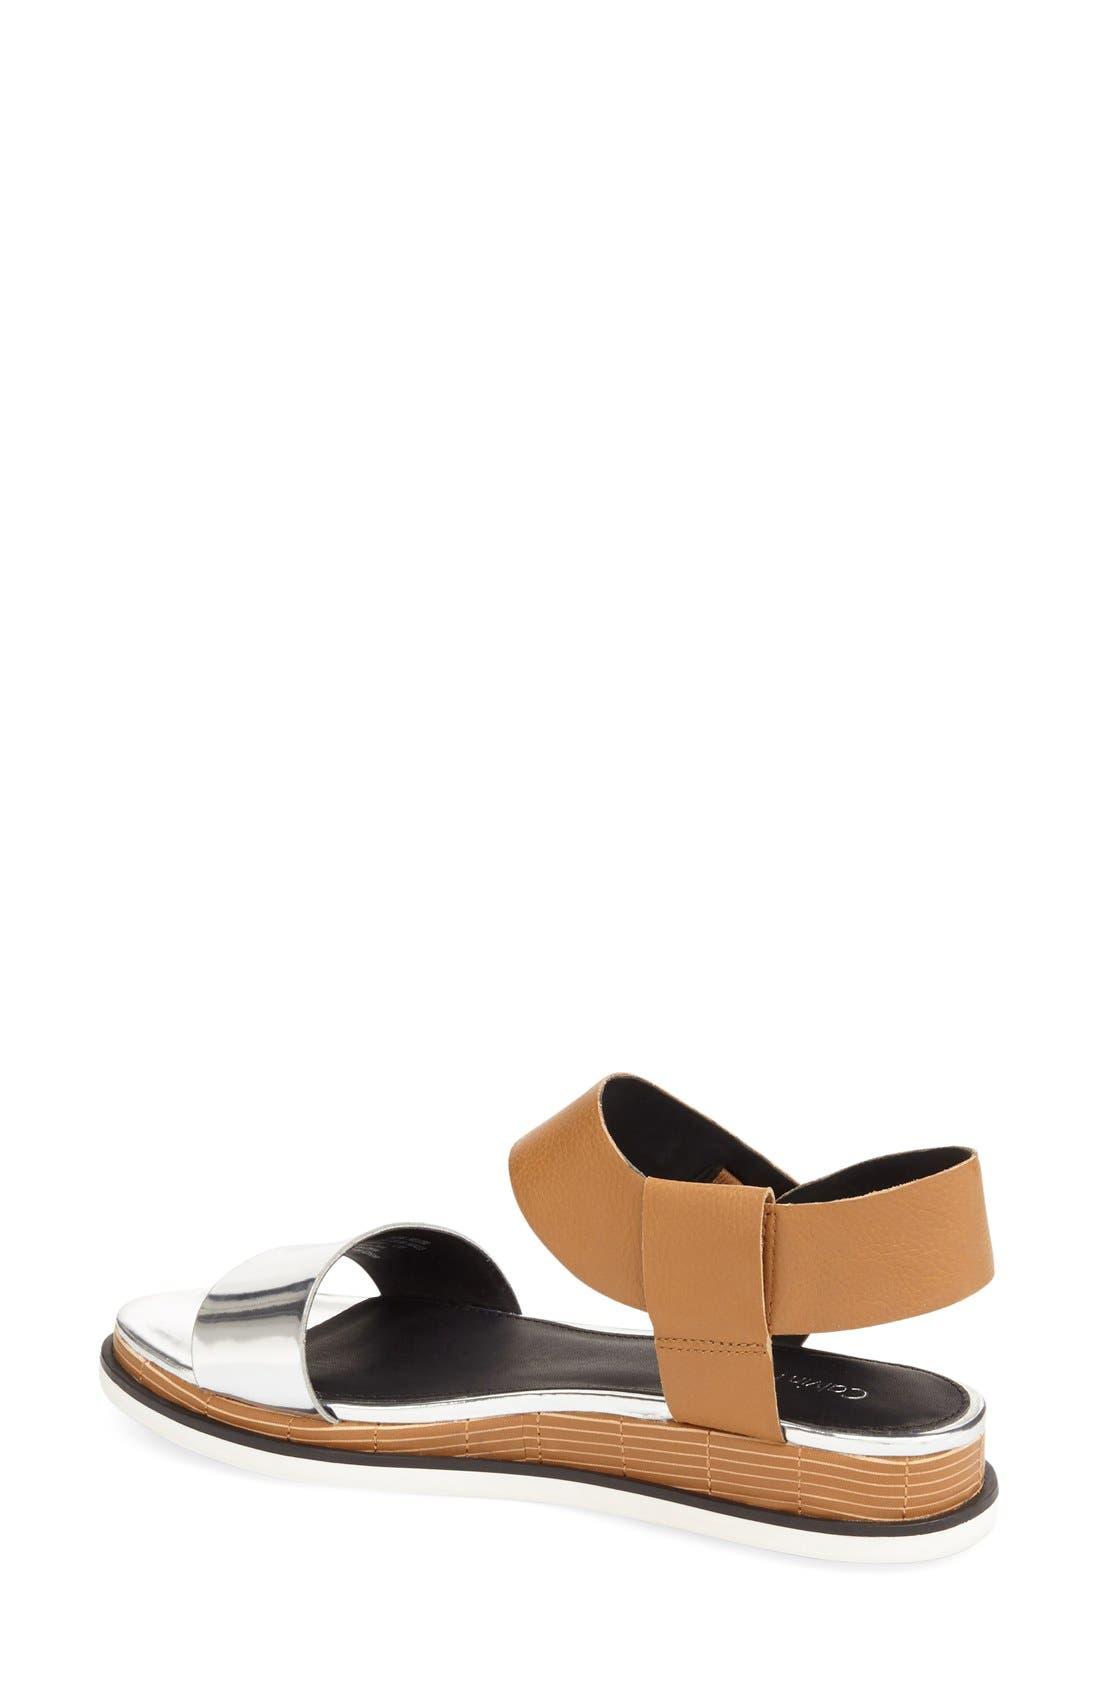 Alternate Image 2  - Calvin Klein 'Cadan' Demi Wedge Sandal (Women)